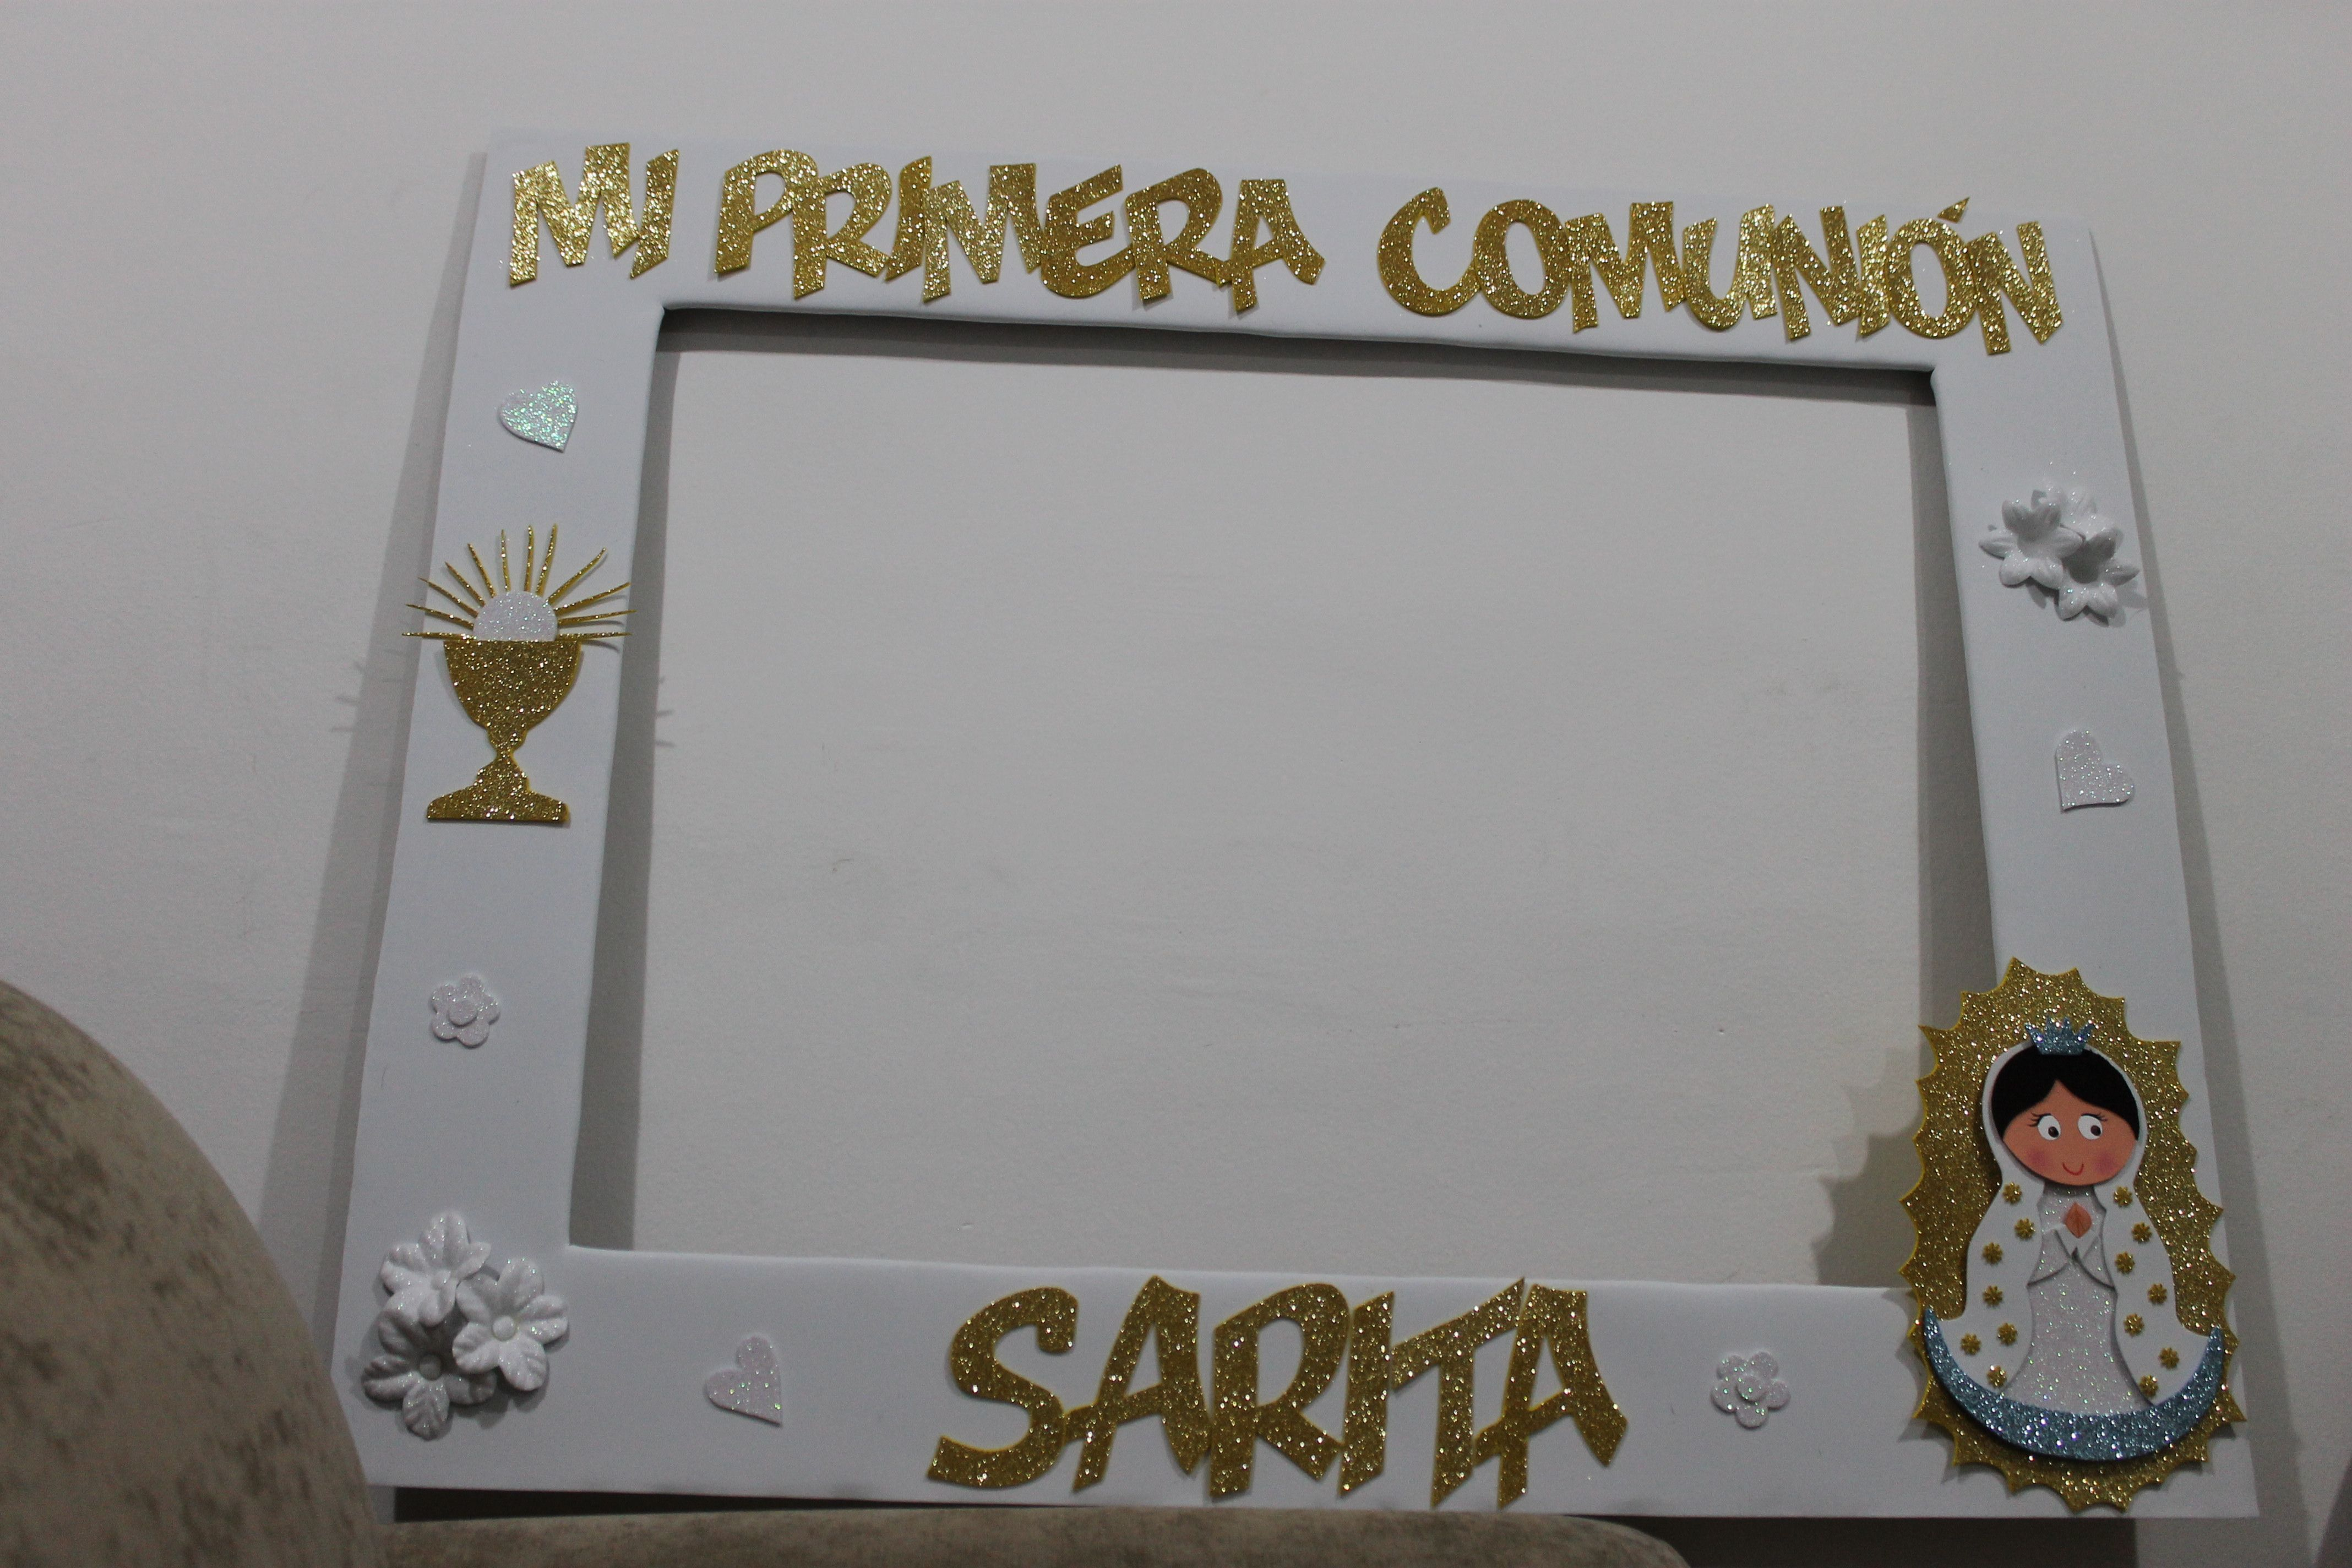 Marco para fotos de primera comuni n comunion - Marcos para fotos economicos ...